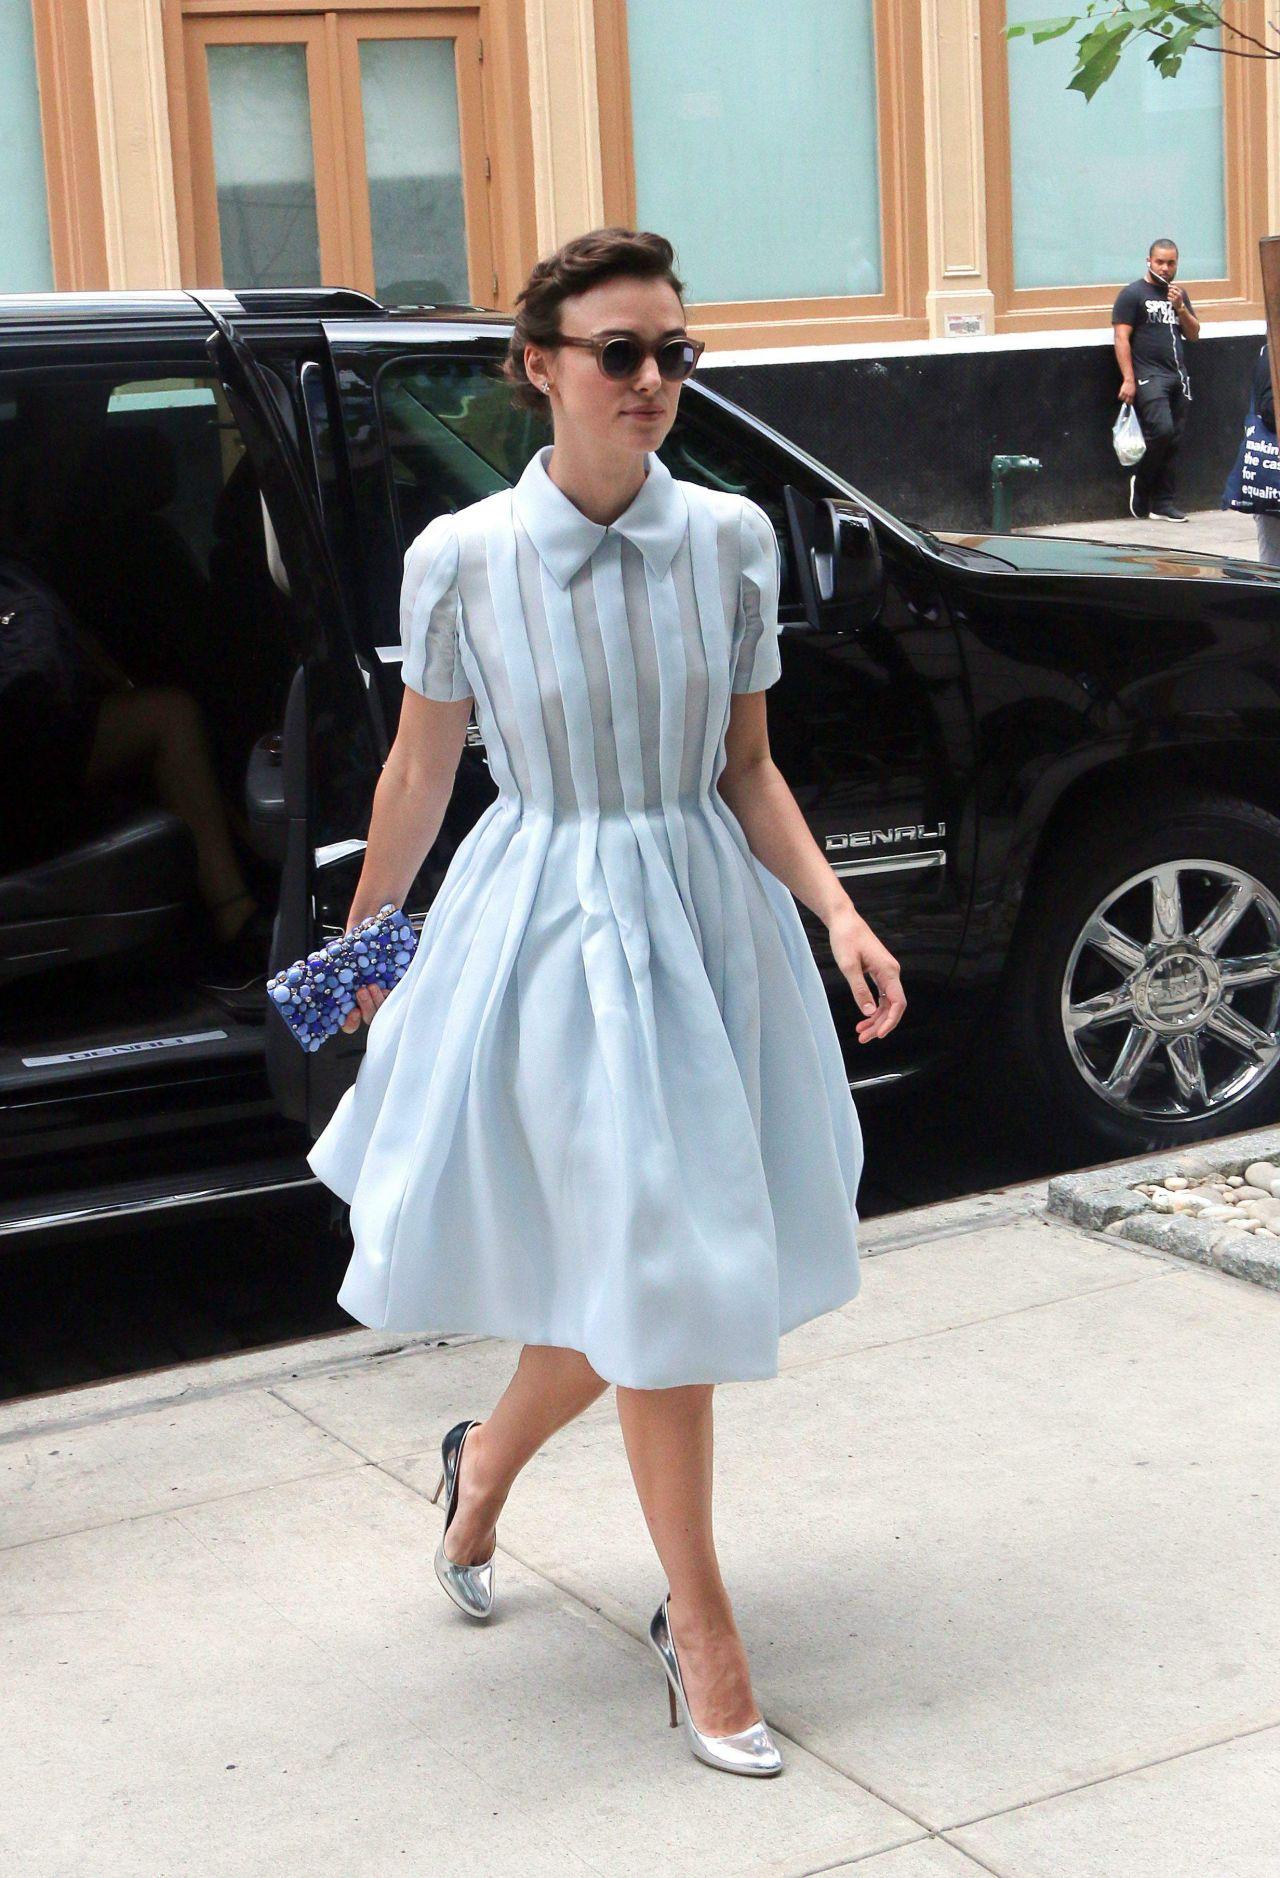 Keira Knightley Wearing Prada Dress Arriving At Downtown